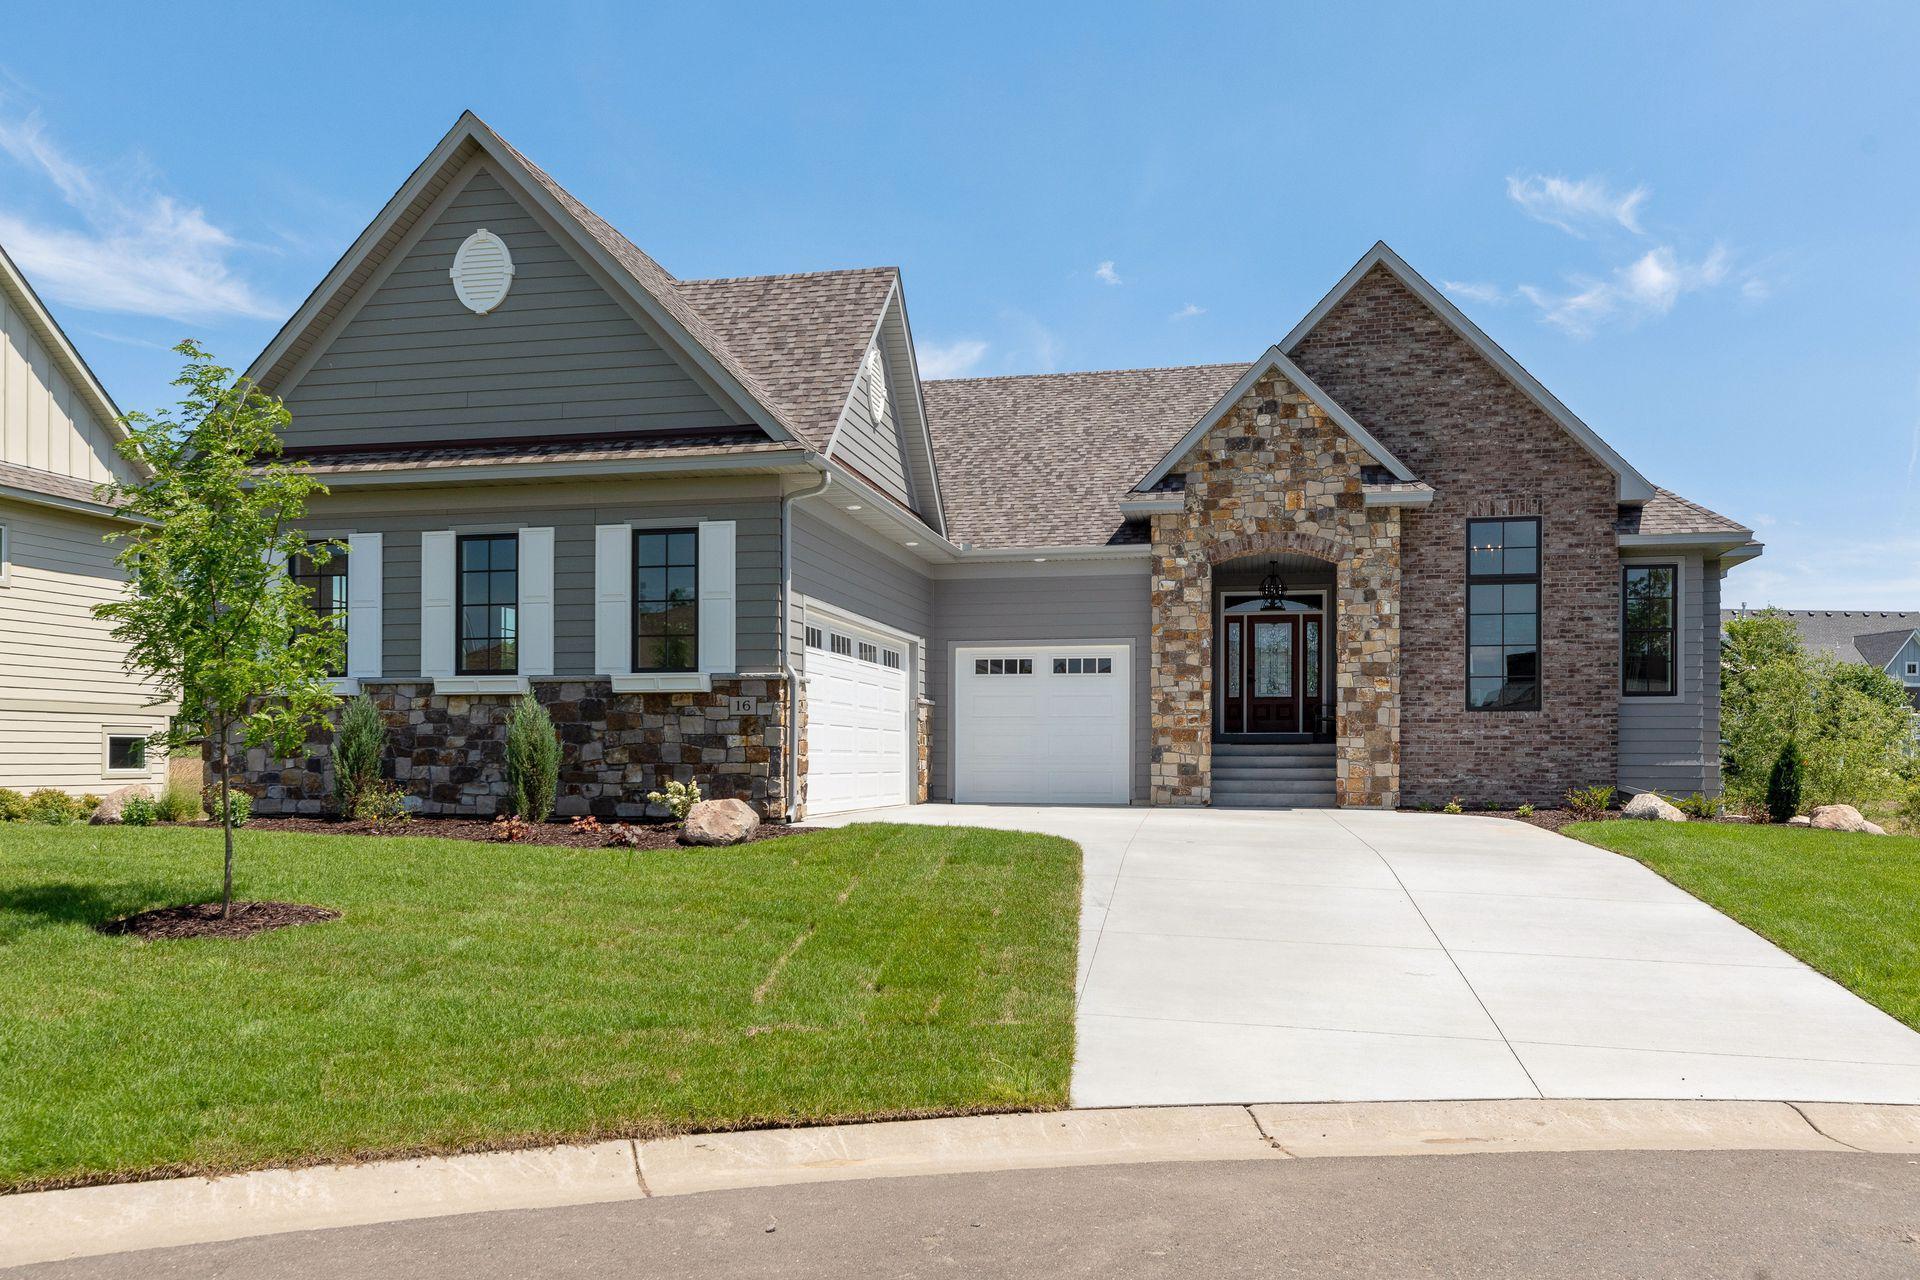 16 Kestrel Property Photo - North Oaks, MN real estate listing